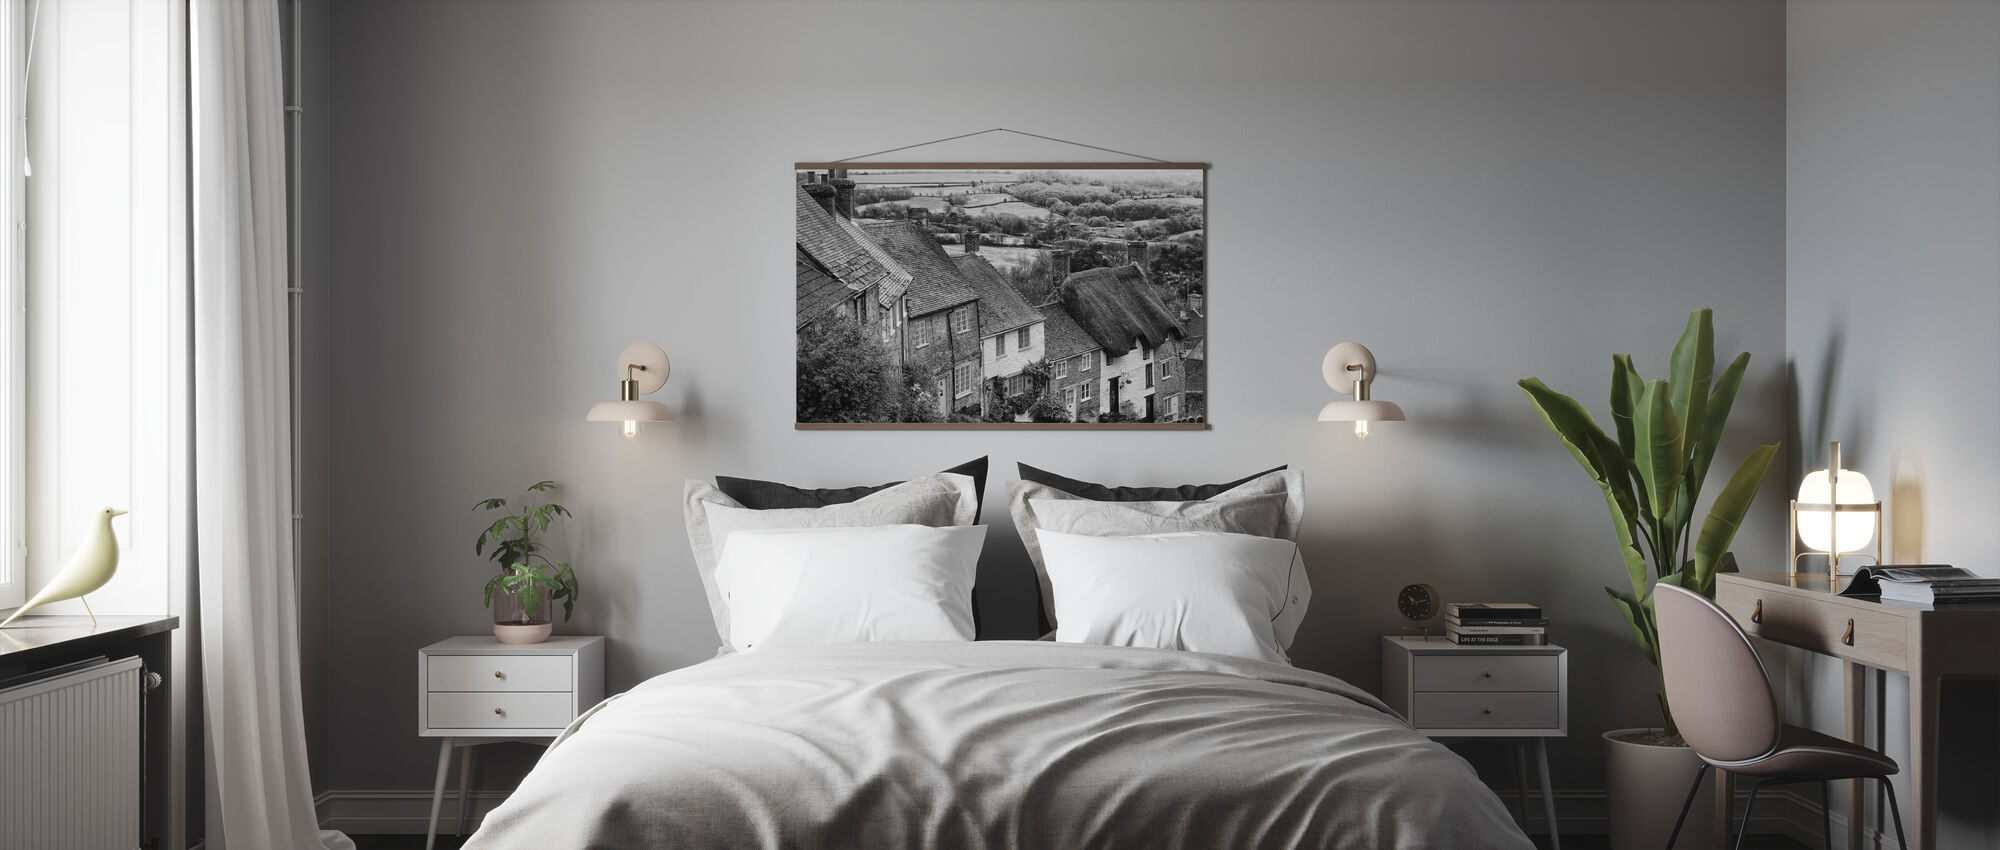 Kulta Hill Shaftsbury Somerset - Juliste - Makuuhuone